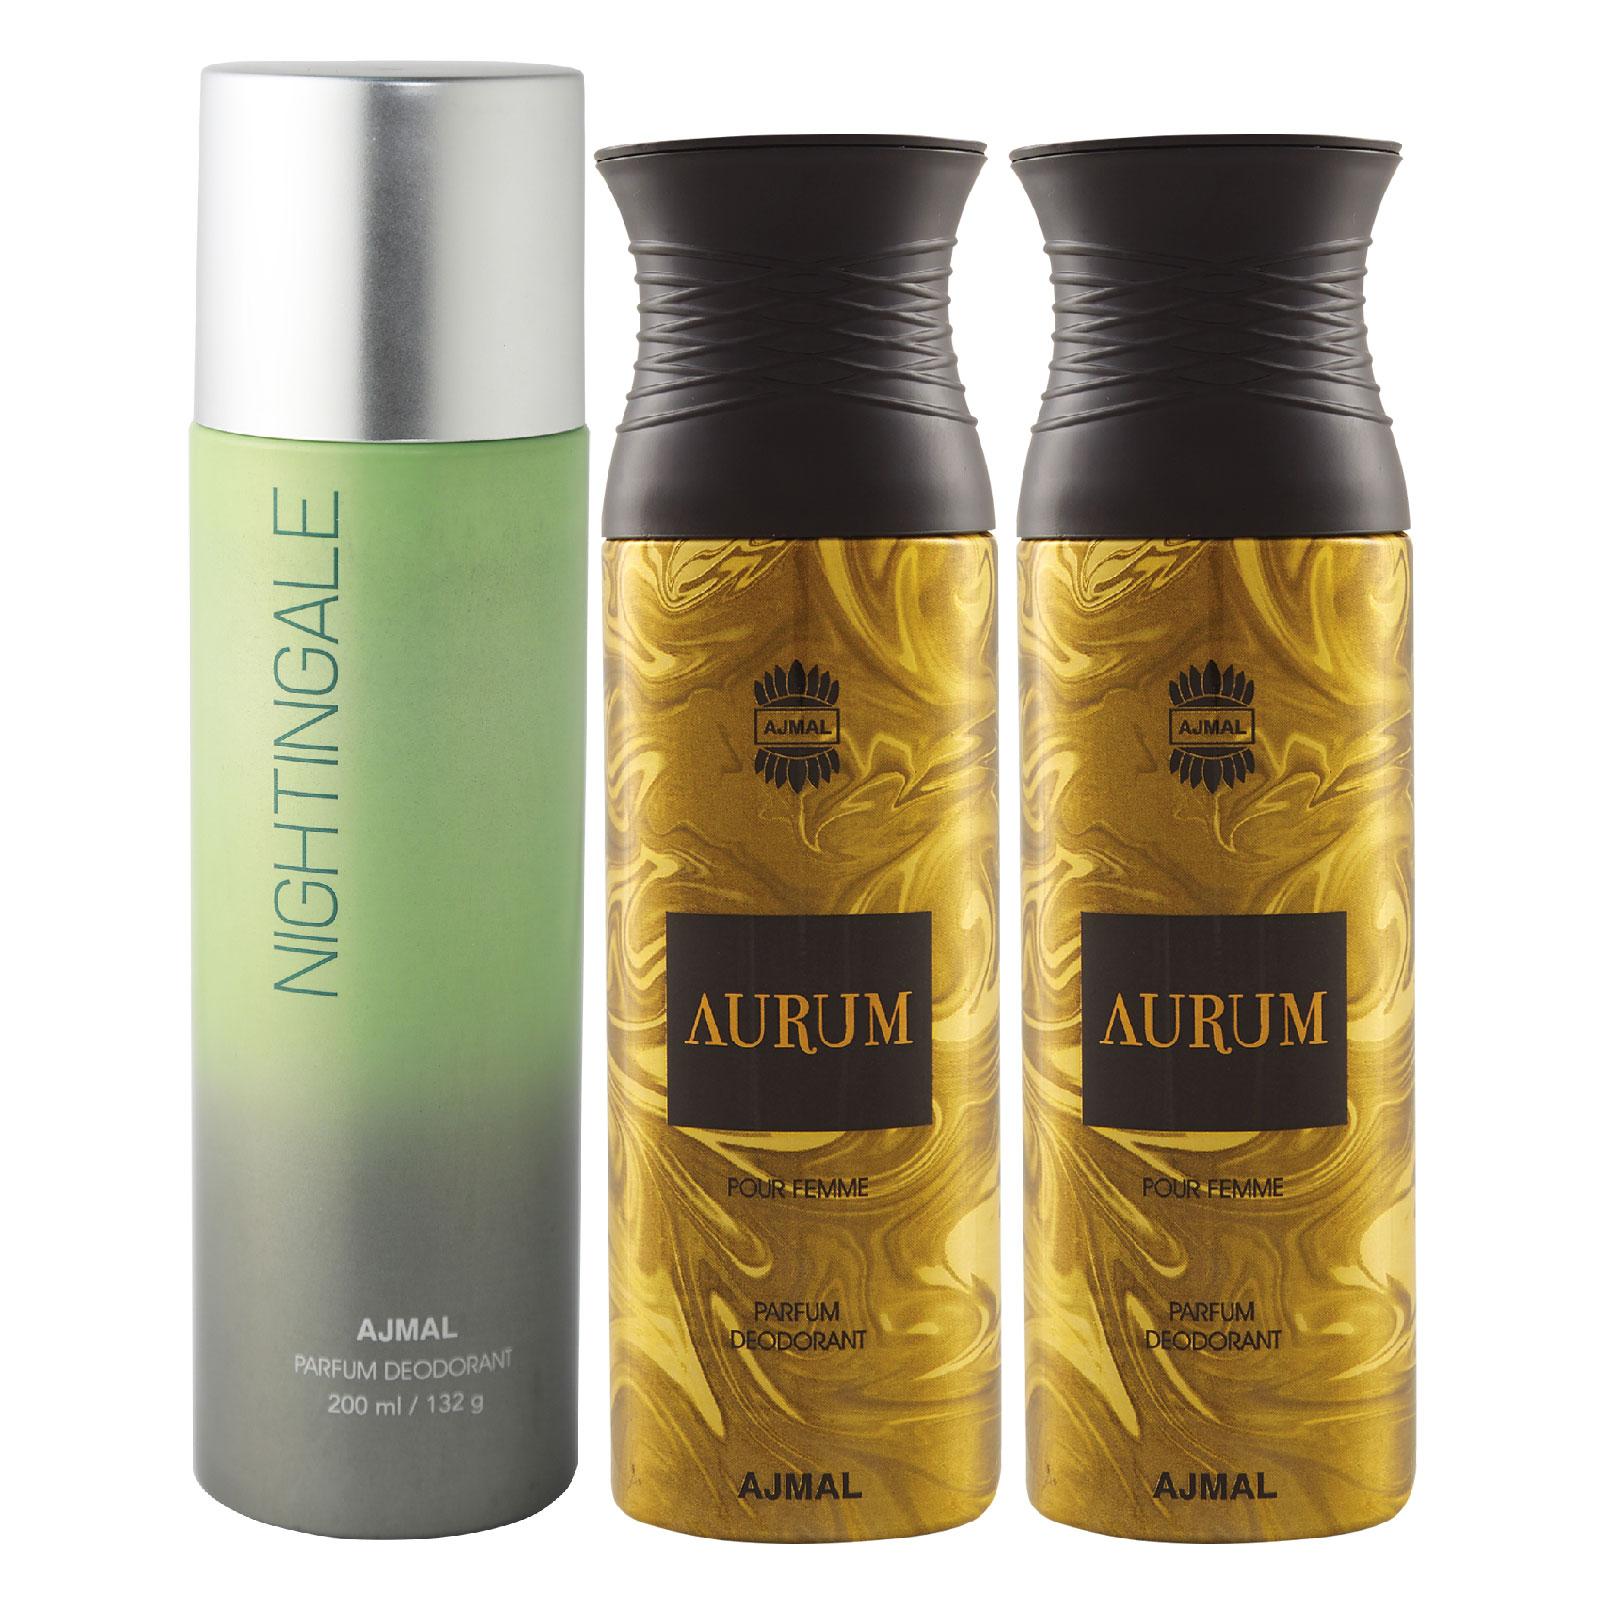 Ajmal   Ajmal 1 Nightingale for Men & Women and 2 Aurum Femme for Women High Quality Deodorants each 200ML Combo pack of 3 (Total 600ML) + 3 Parfum Testers